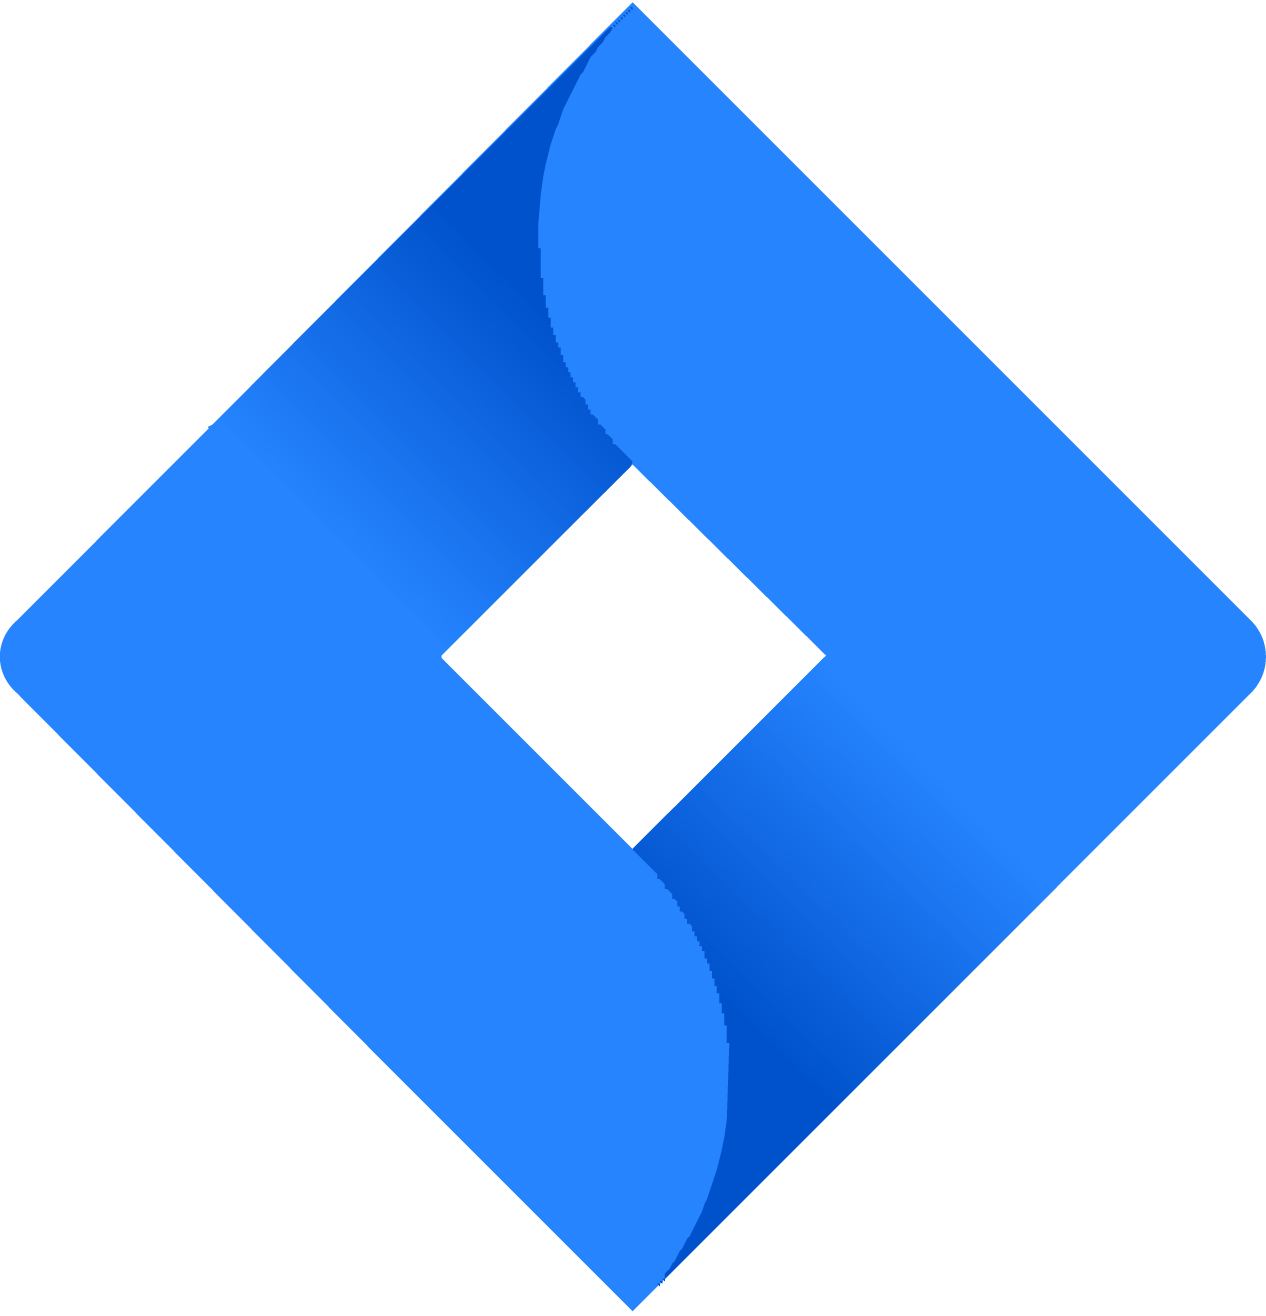 jira software logo png svg download  logo  icons  clipart lego clipart logo clipart software